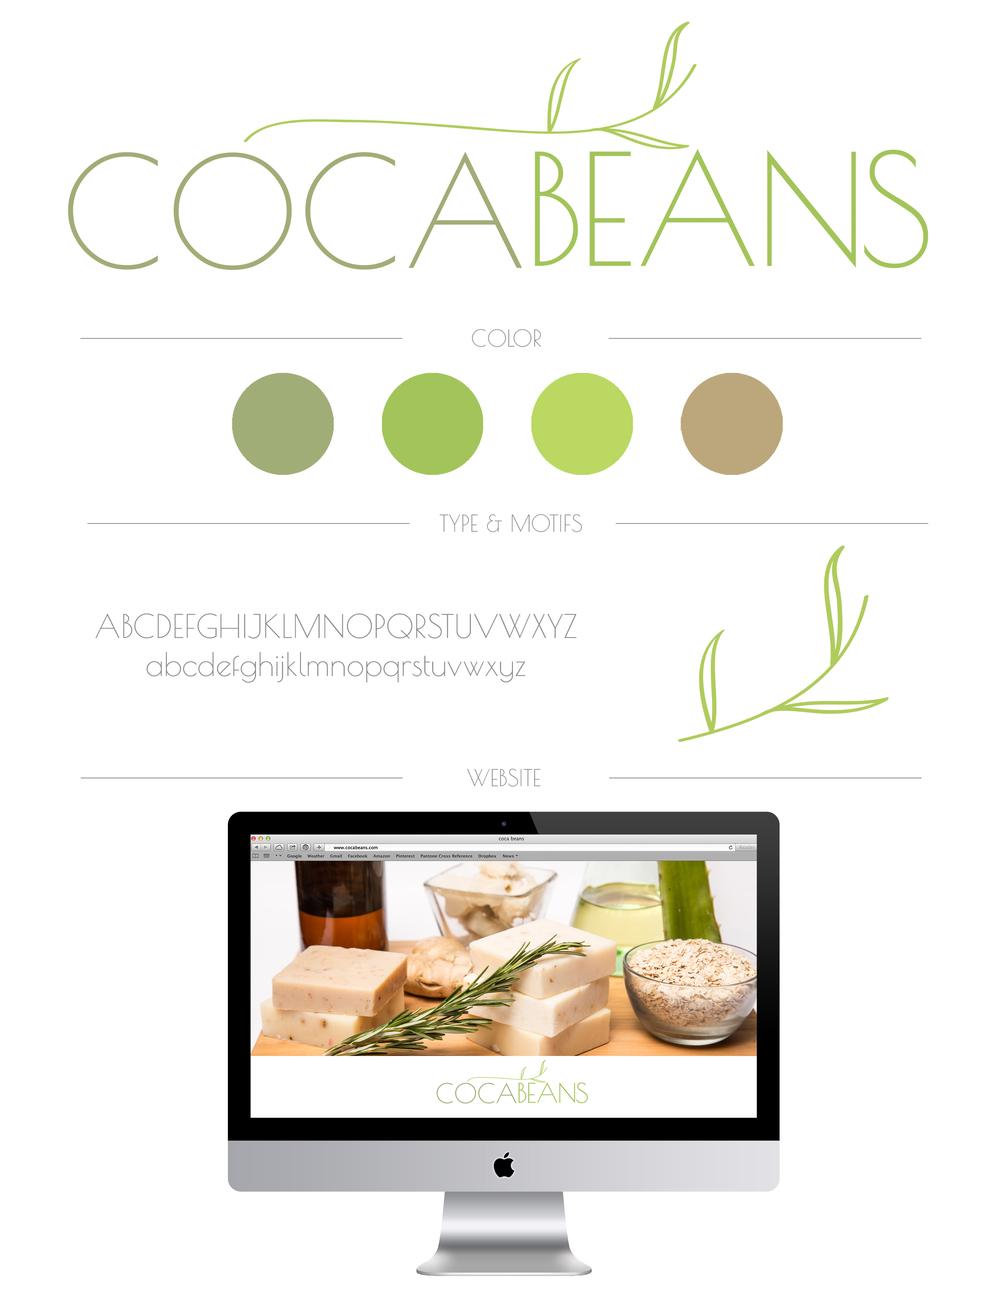 CocaBeans.jpg